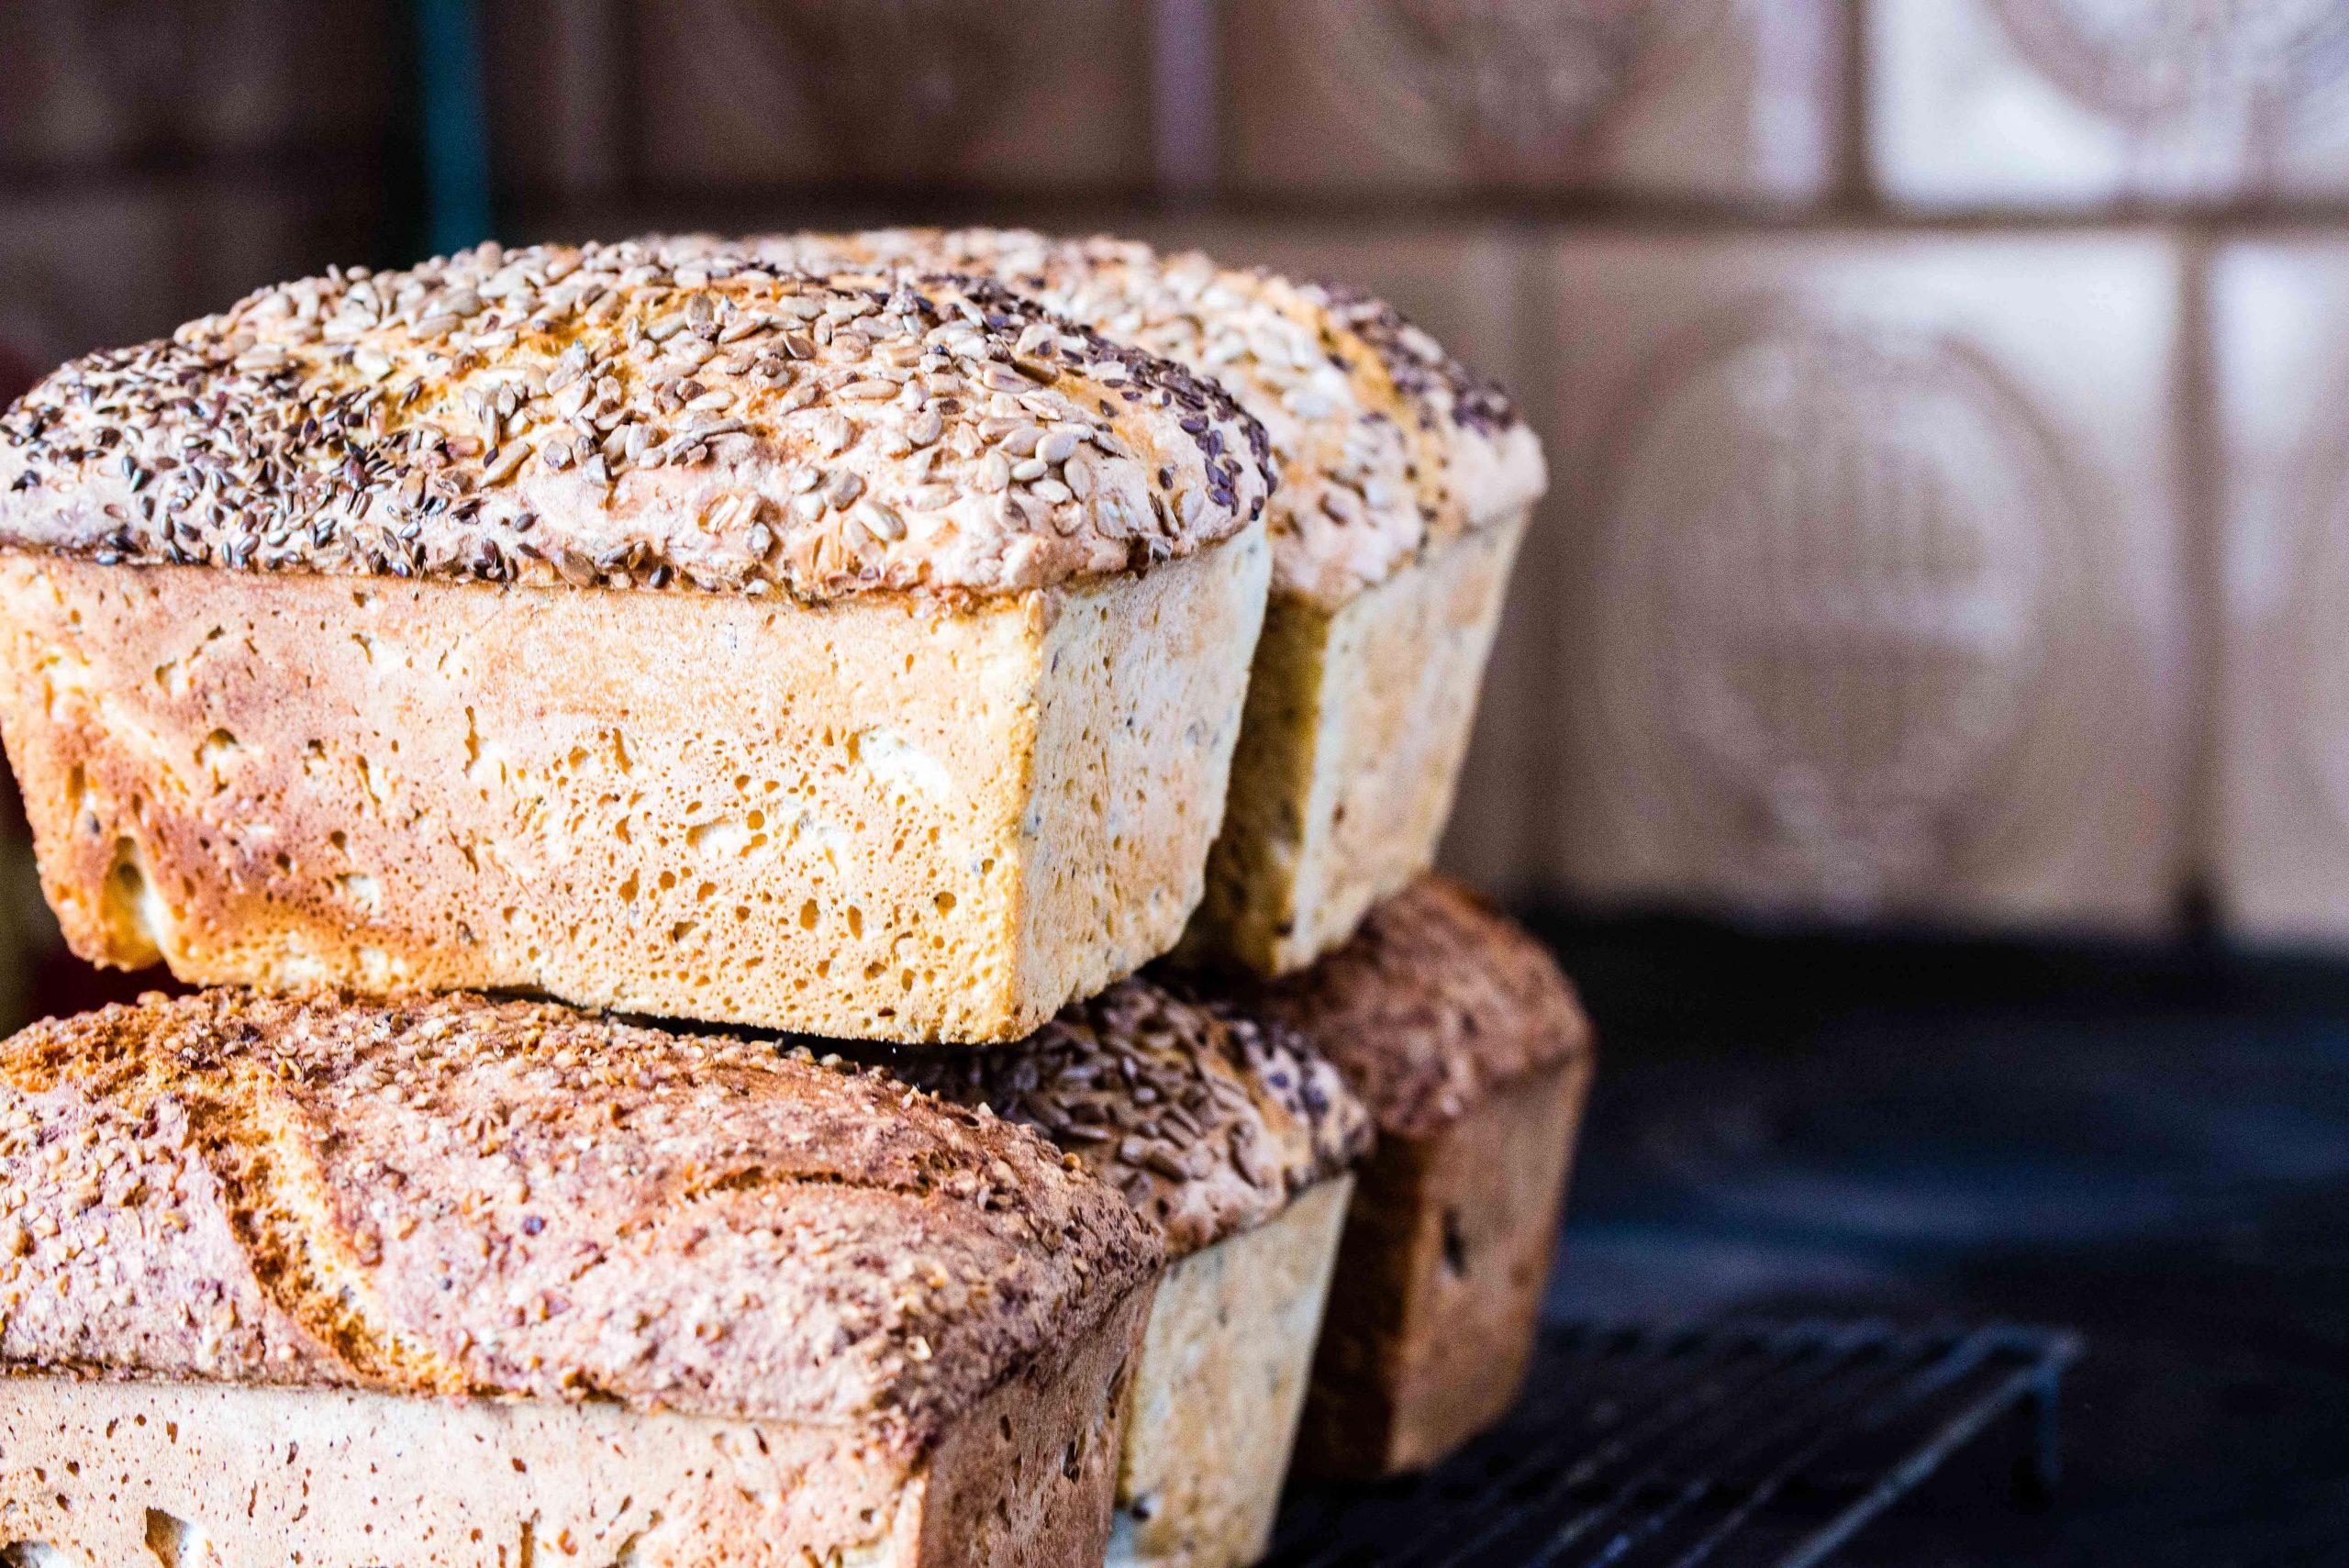 Karola Bober 7 1 scaled - Artisan bread in pomorskie - tradition and modernity